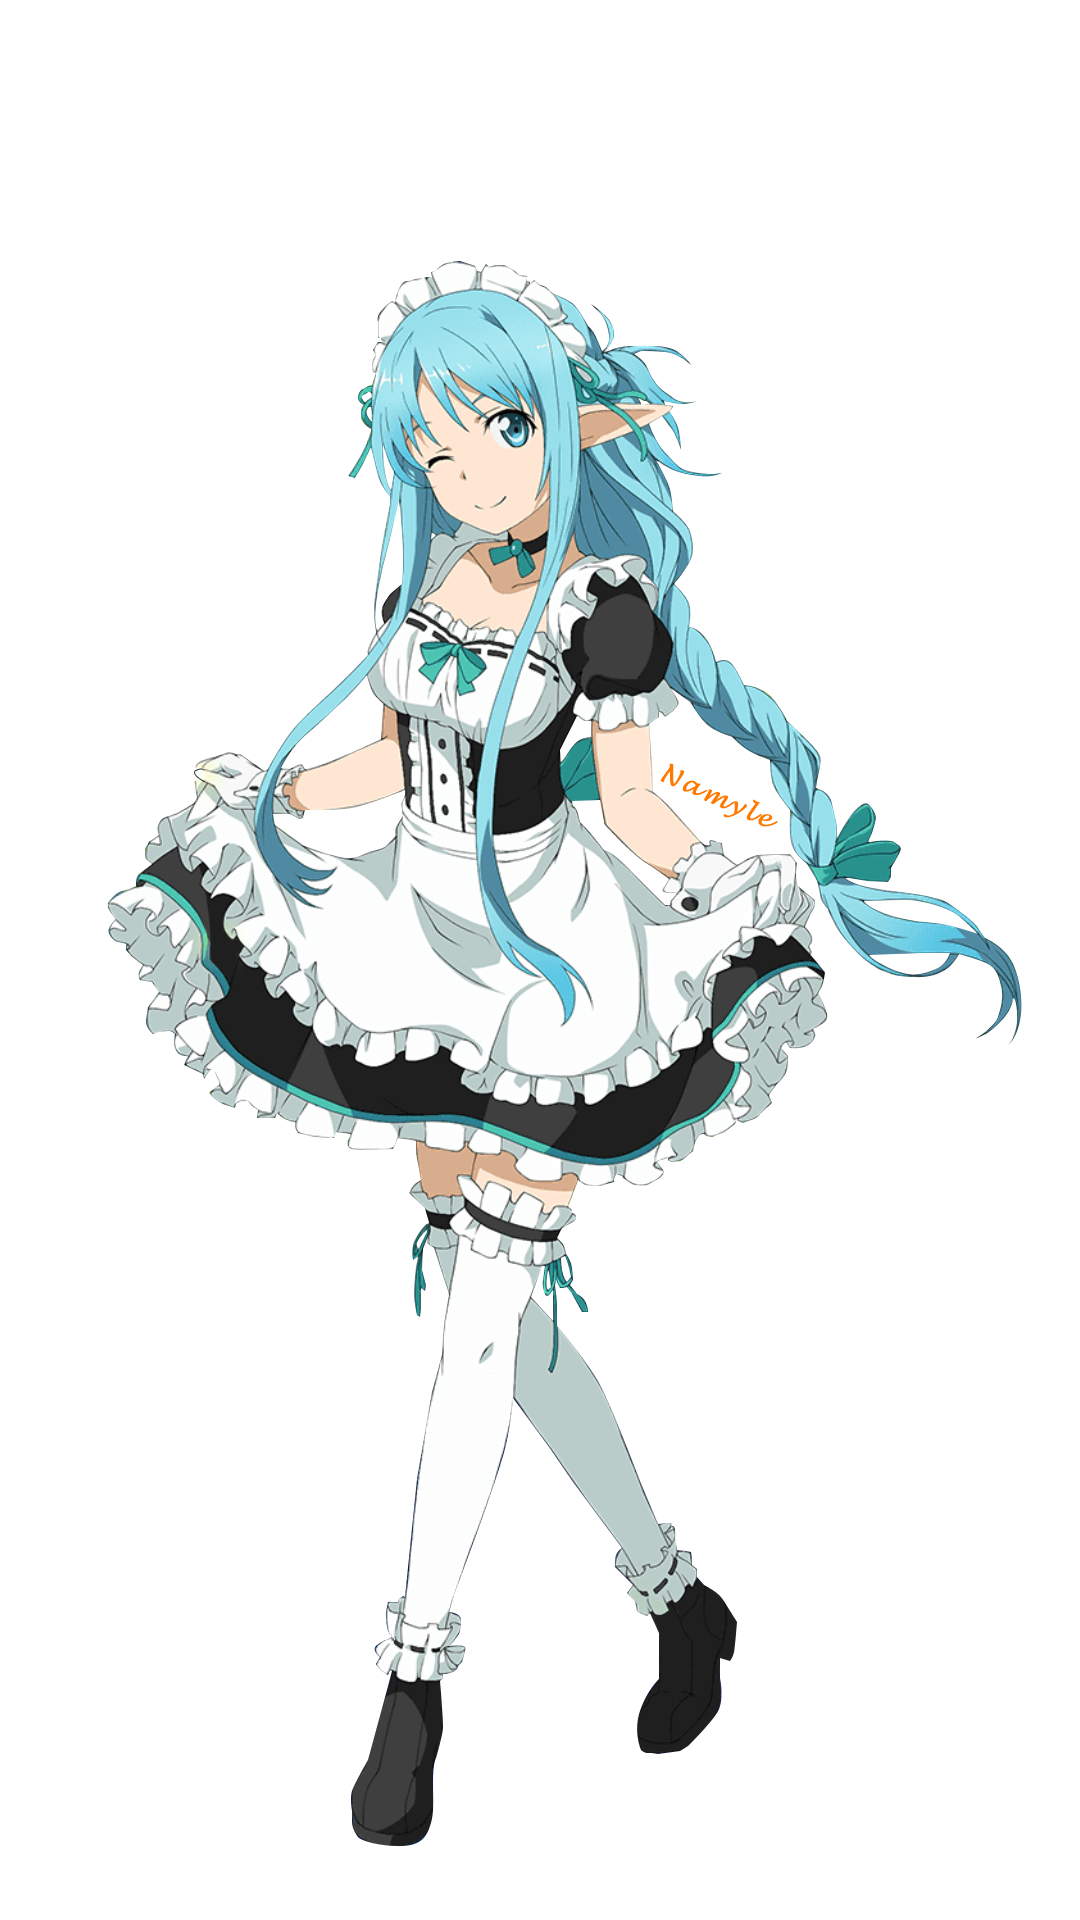 render Asuna Yuuki the maid